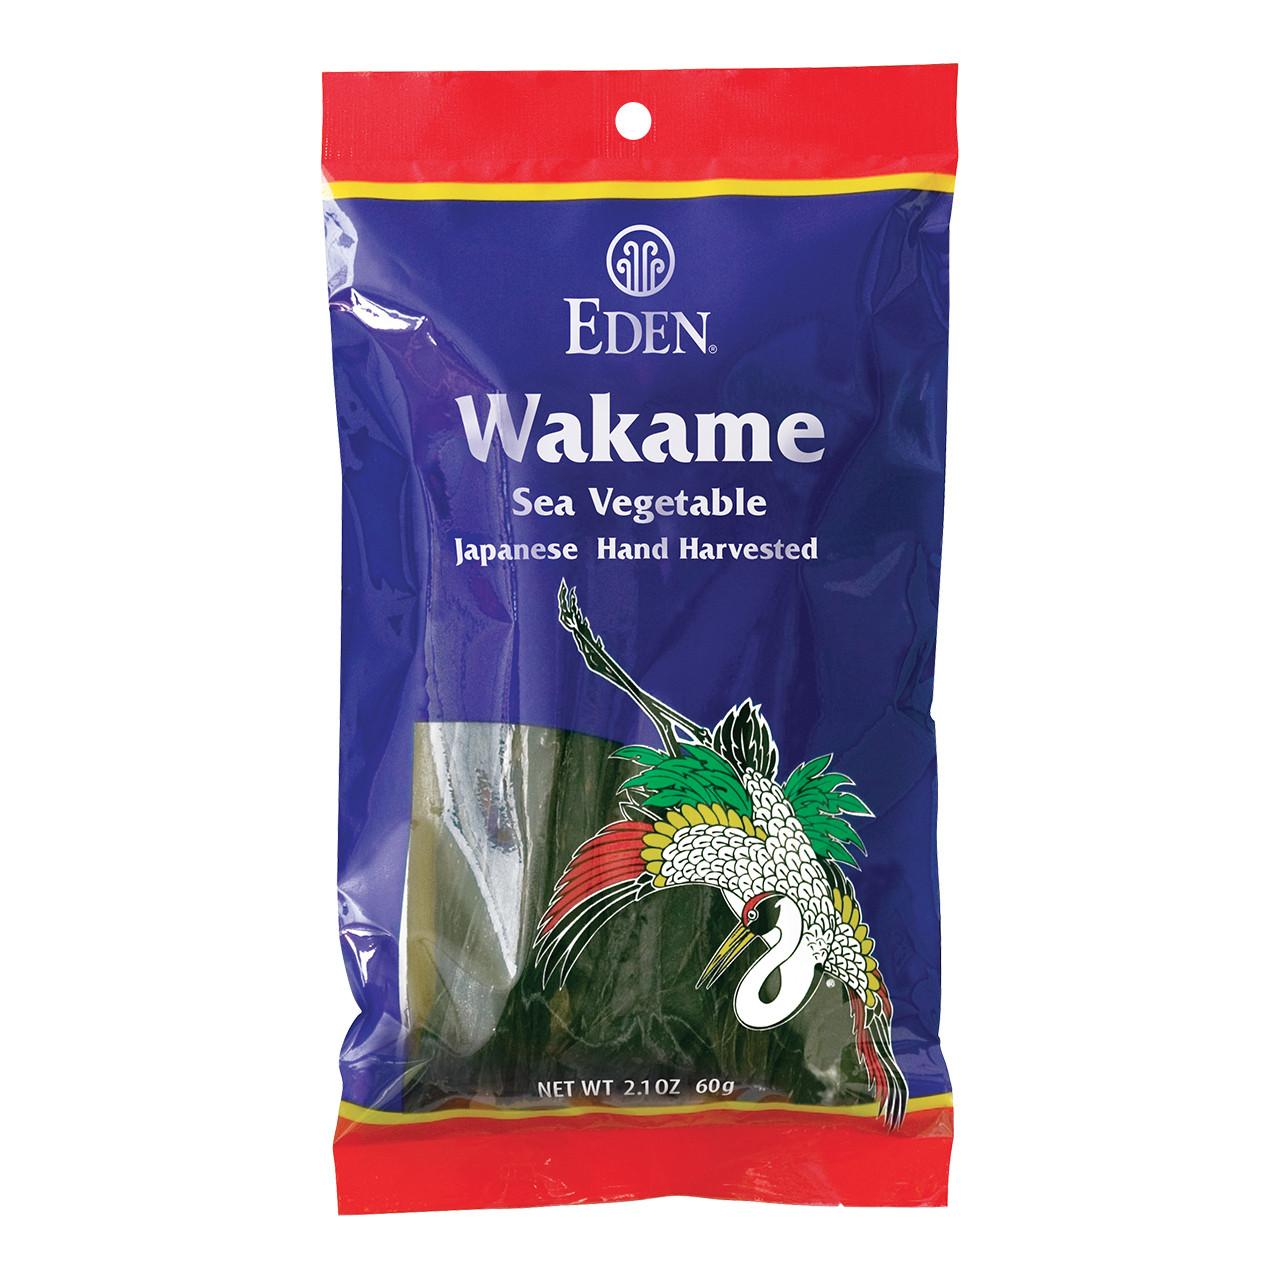 Wakame, Sea Vegetable